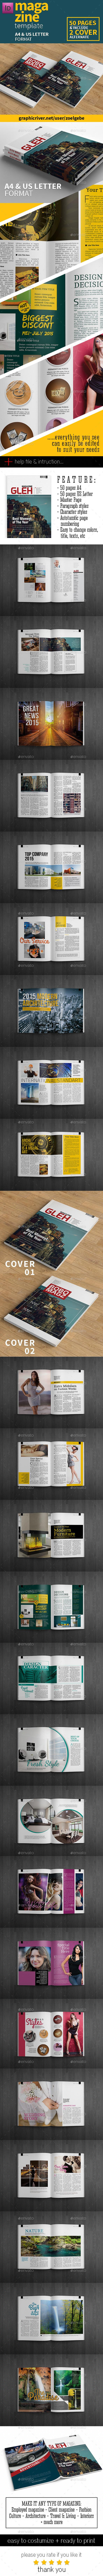 GraphicRiver Indesign Magazine Template 11378531